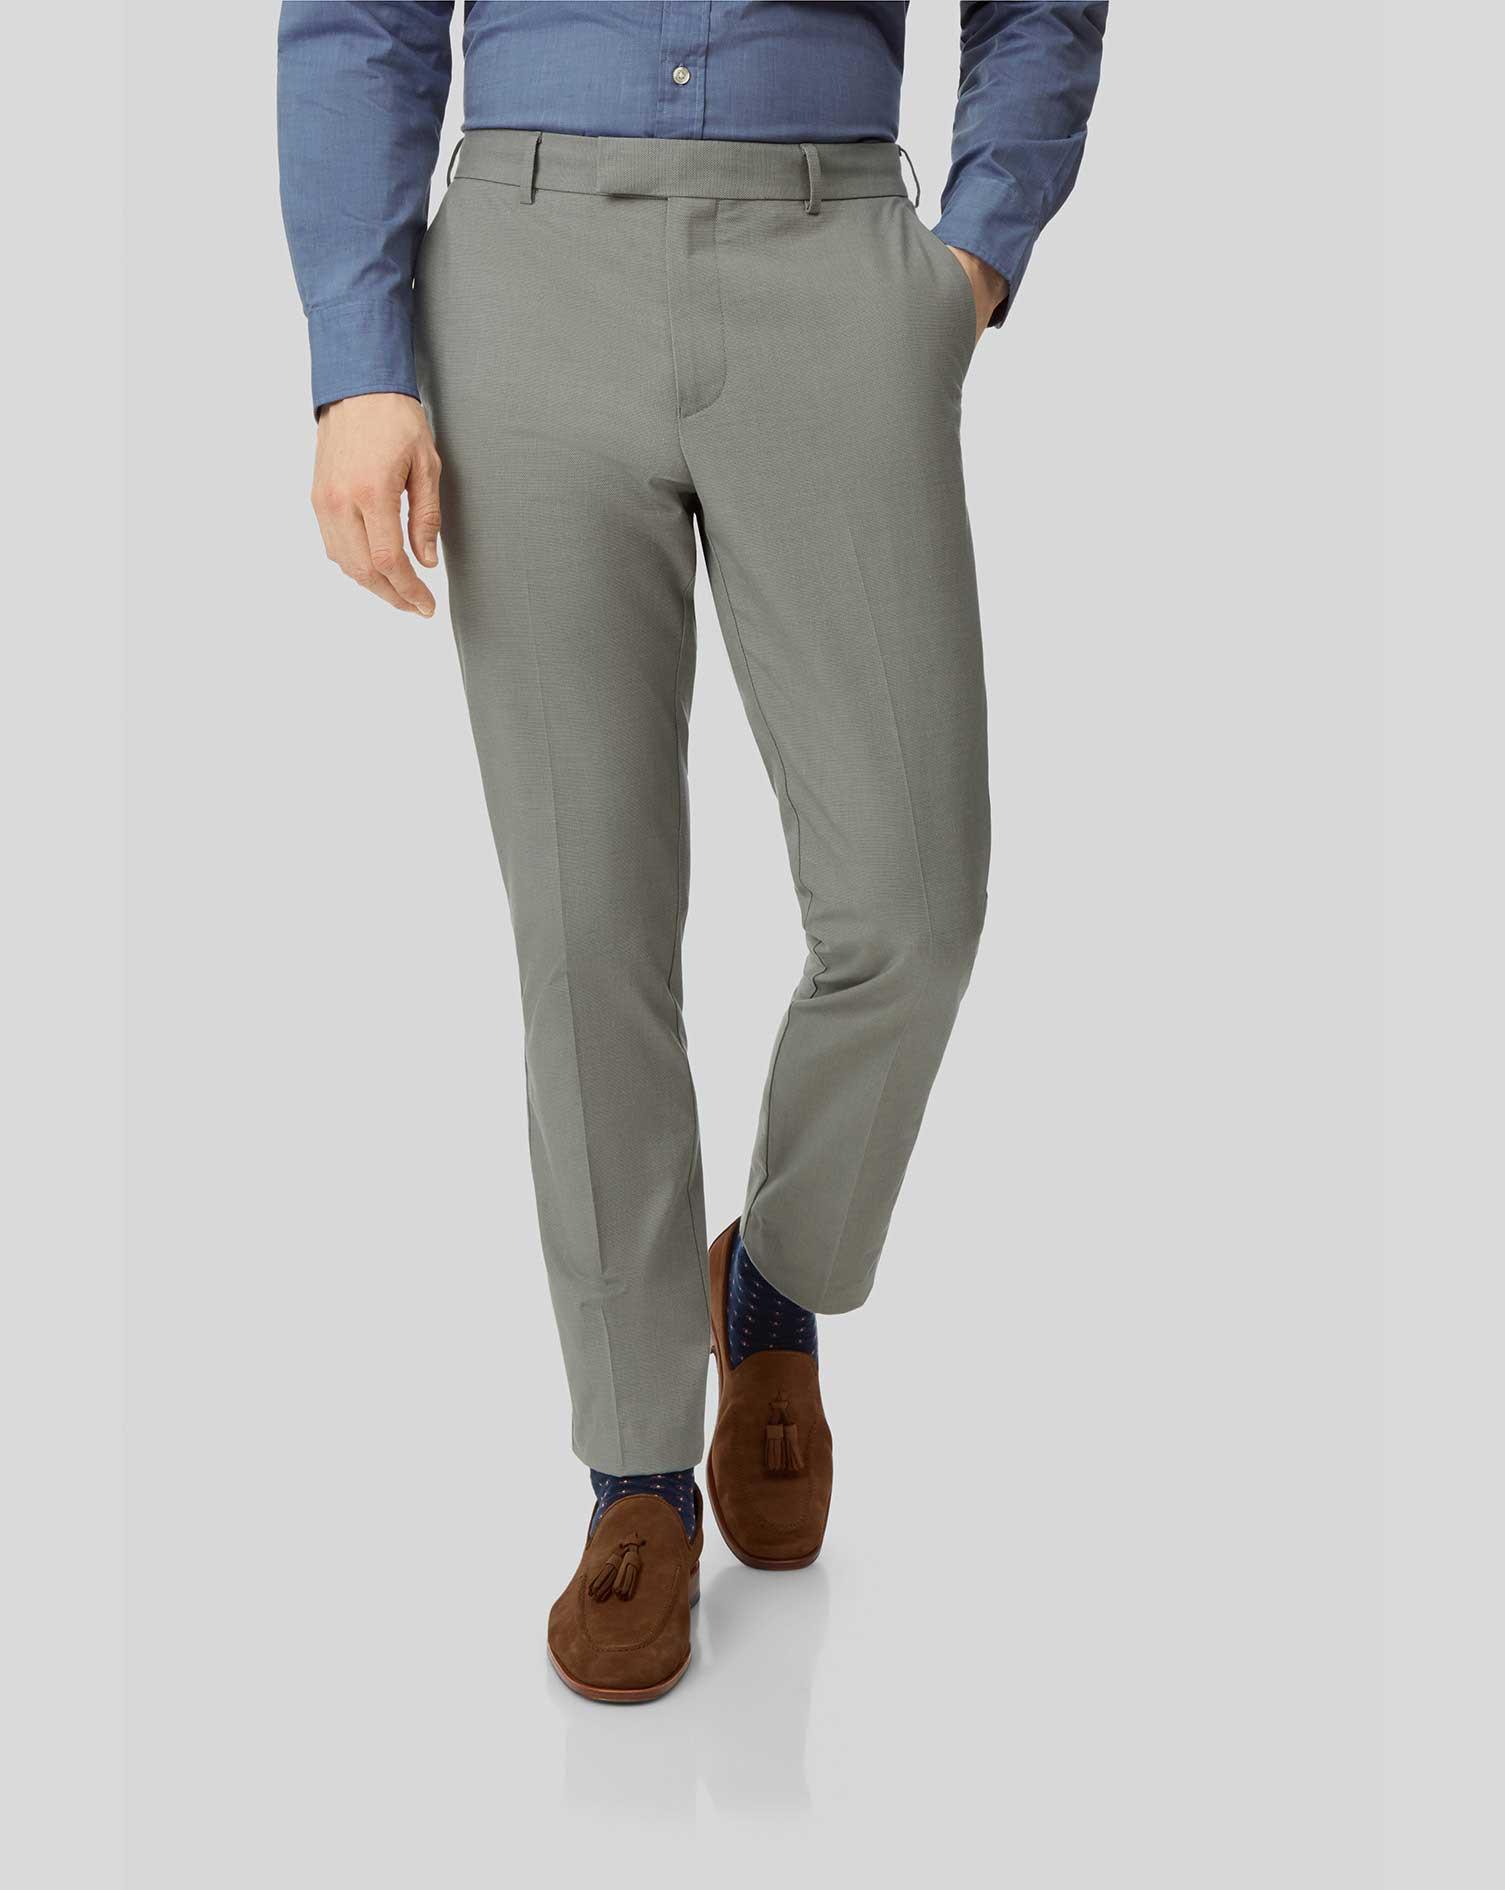 Cotton Non-Iron Stretch Trousers - Green